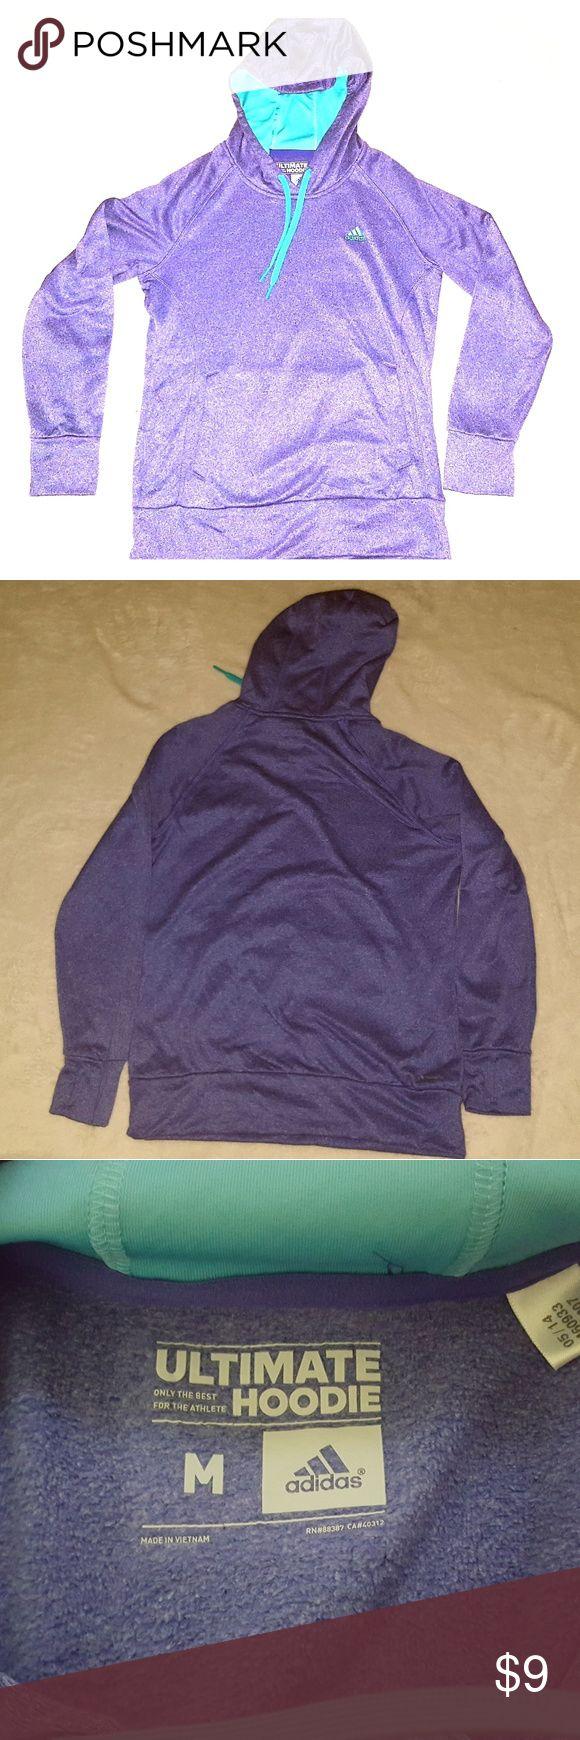 ADIDAS ultimate hoodie. Women's ultimate hoodie climawarm. Gently used. Purple and turquoise. Adidas Tops Sweatshirts & Hoodies